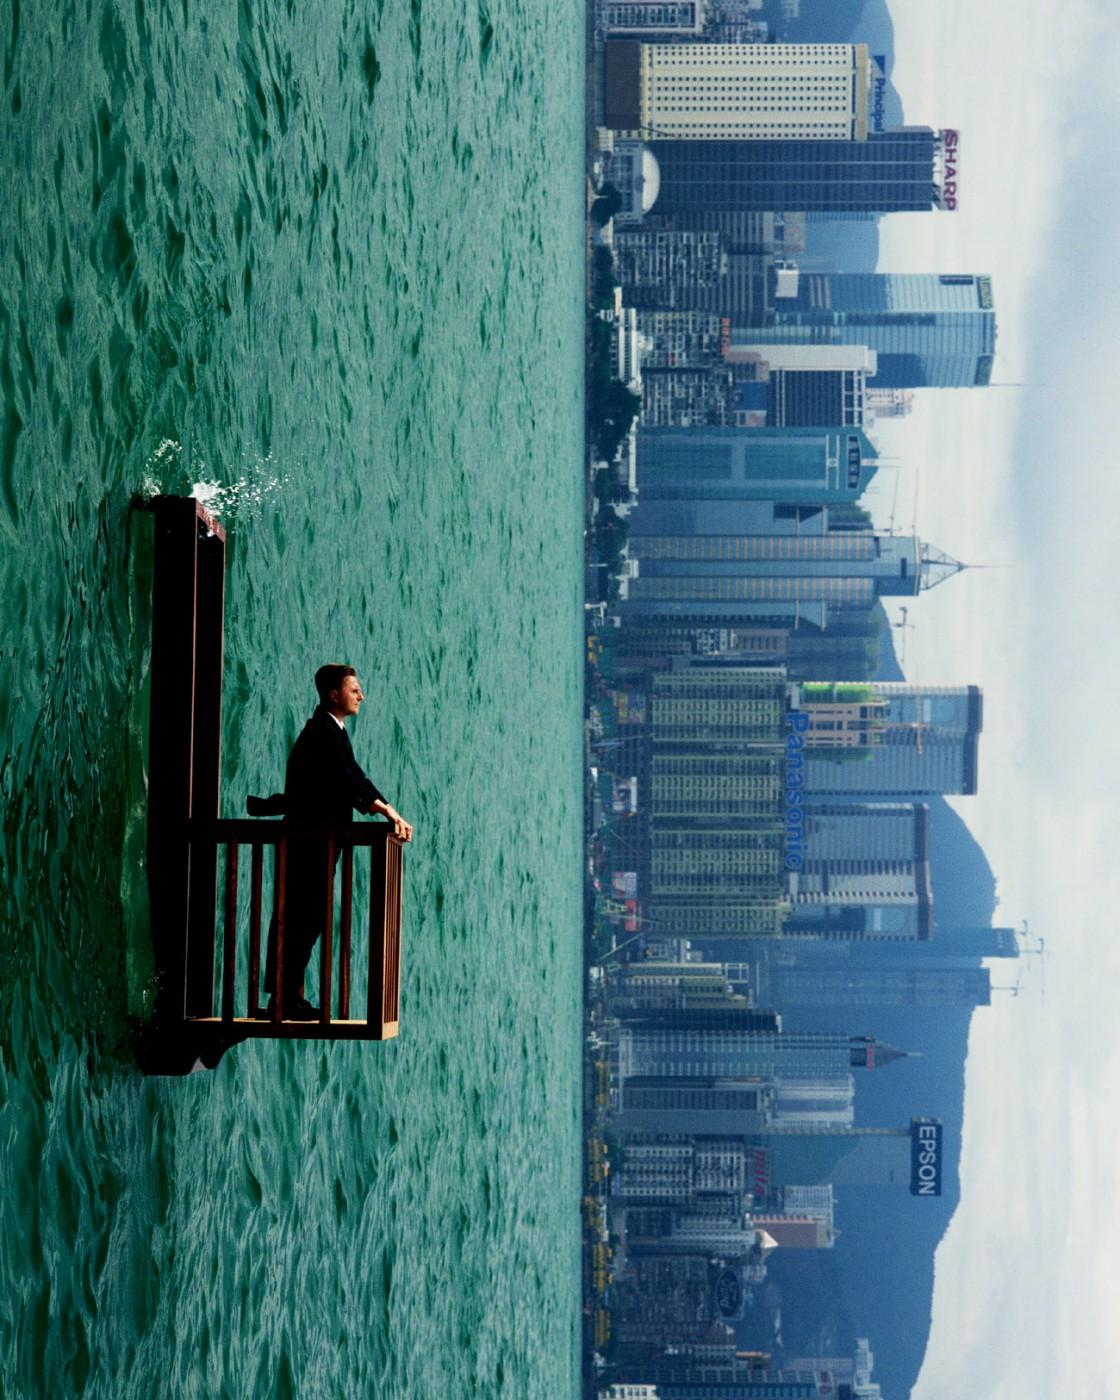 Philippe Ramette, Balcon 2 (Hong-Kong), 2001, </span><span><em>Photographer: Marc Domage Courtesy Galerie Xippas</em>